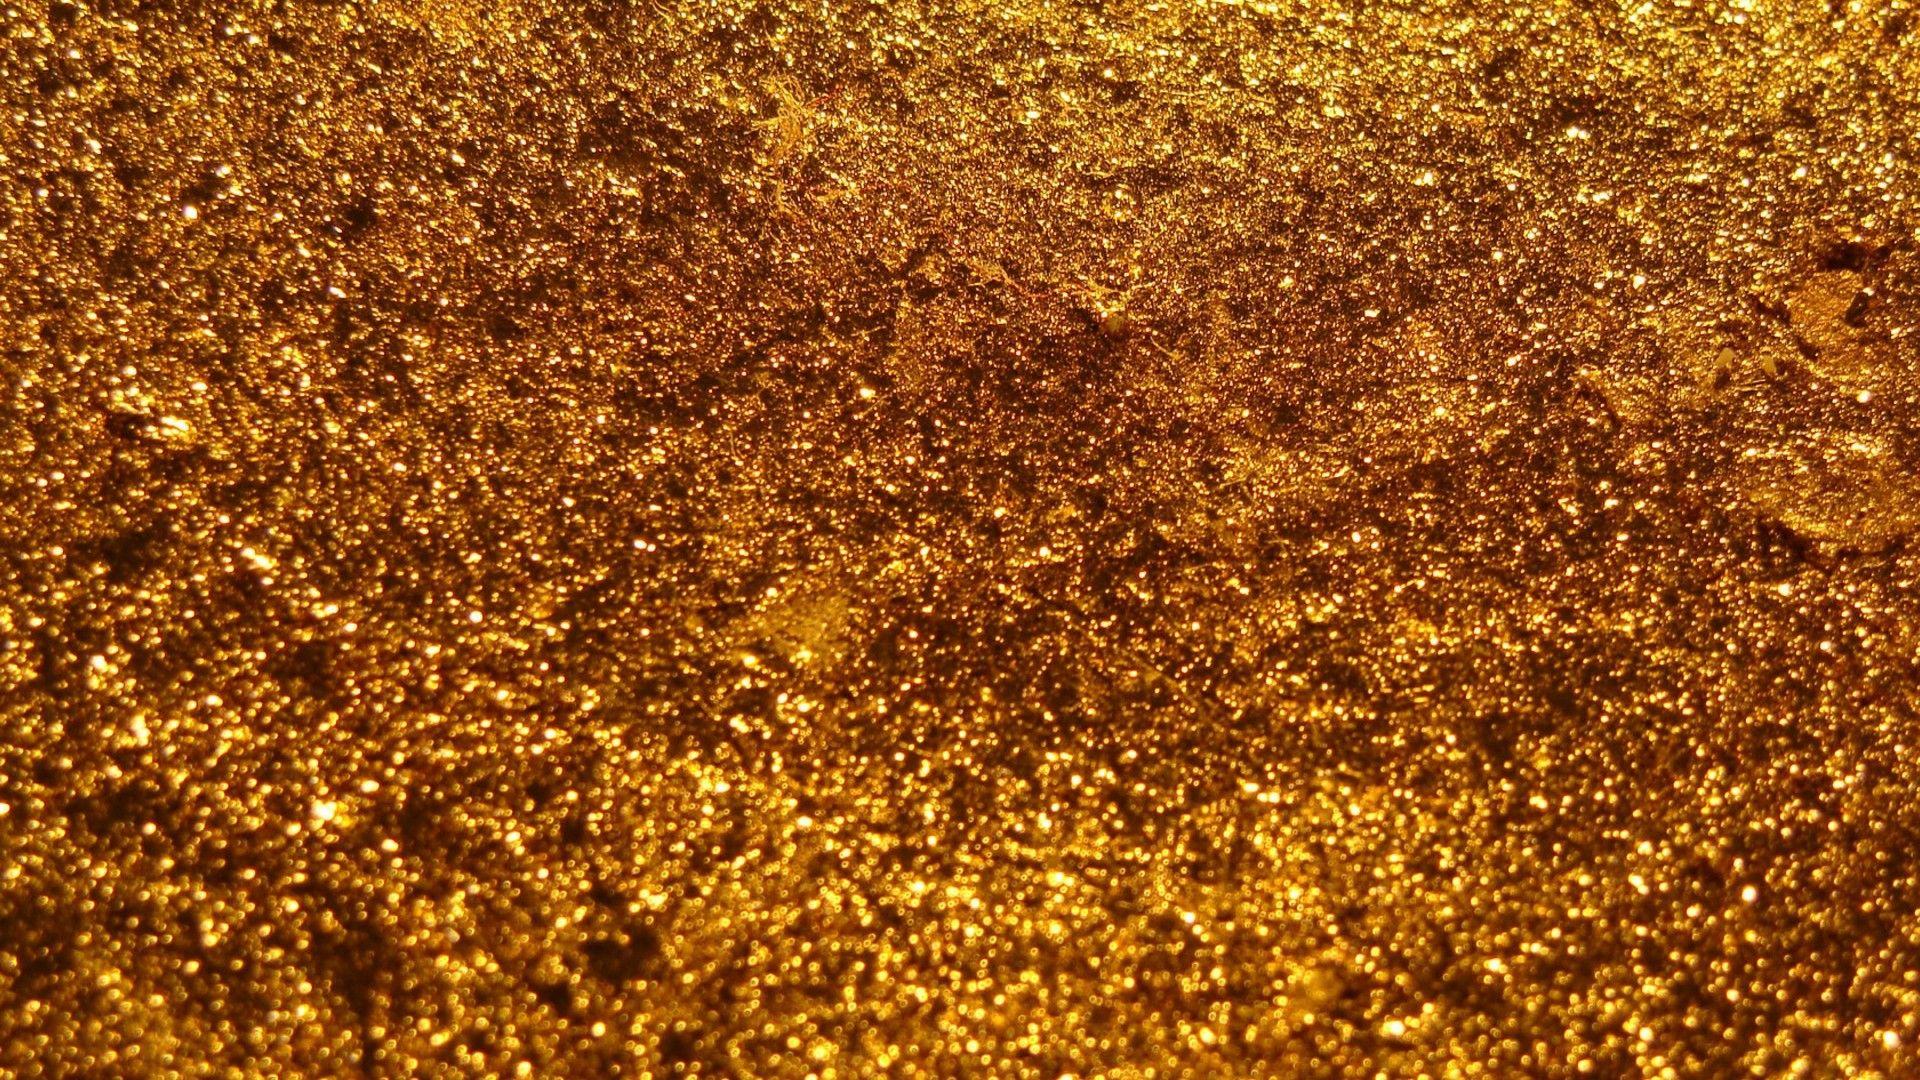 Pc Wallpaper Gold Glitter Best Hd Wallpapers Wallpaperscute In